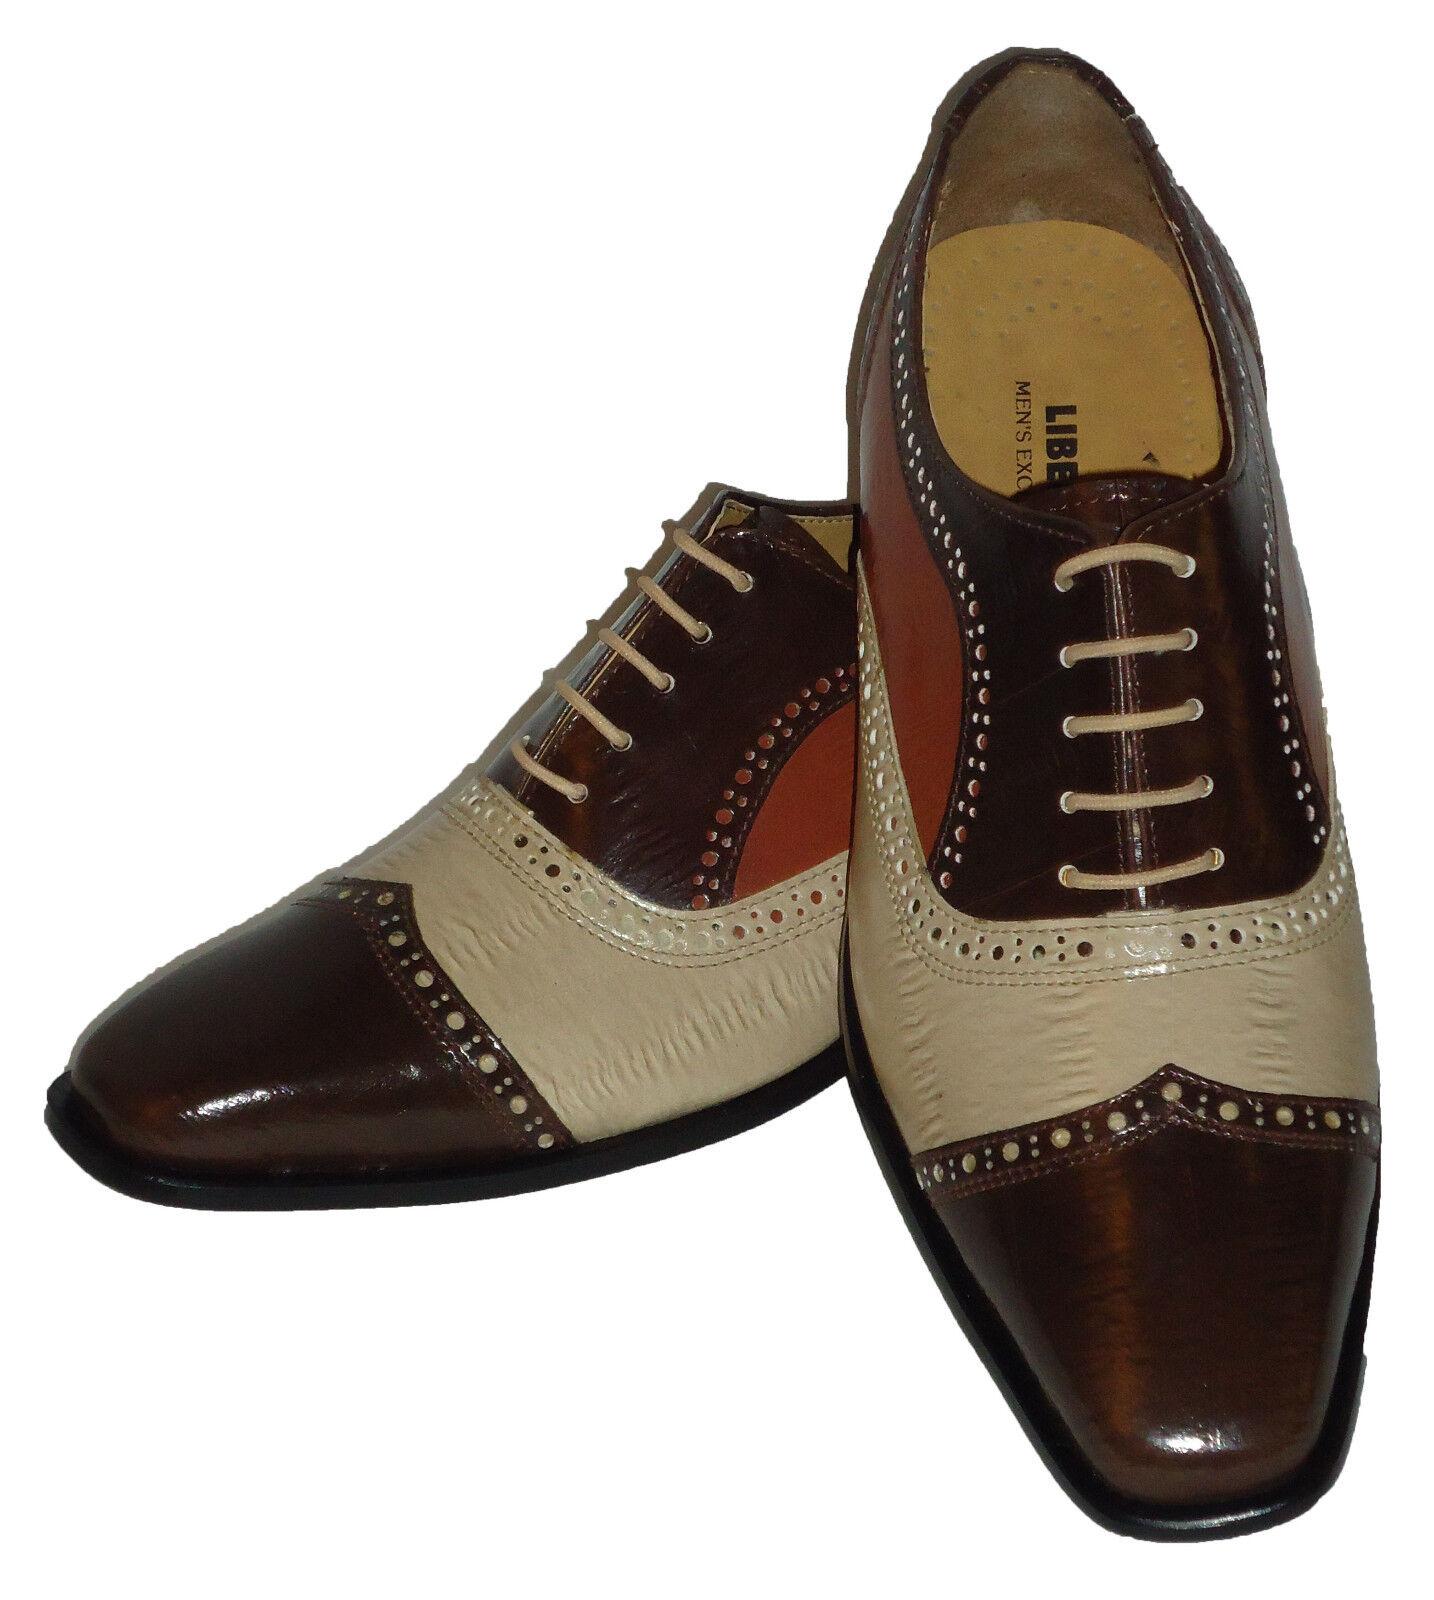 Liberty LS1047 Mens Spectator Fashion Dress Shoes Most Elegant Brown Trio